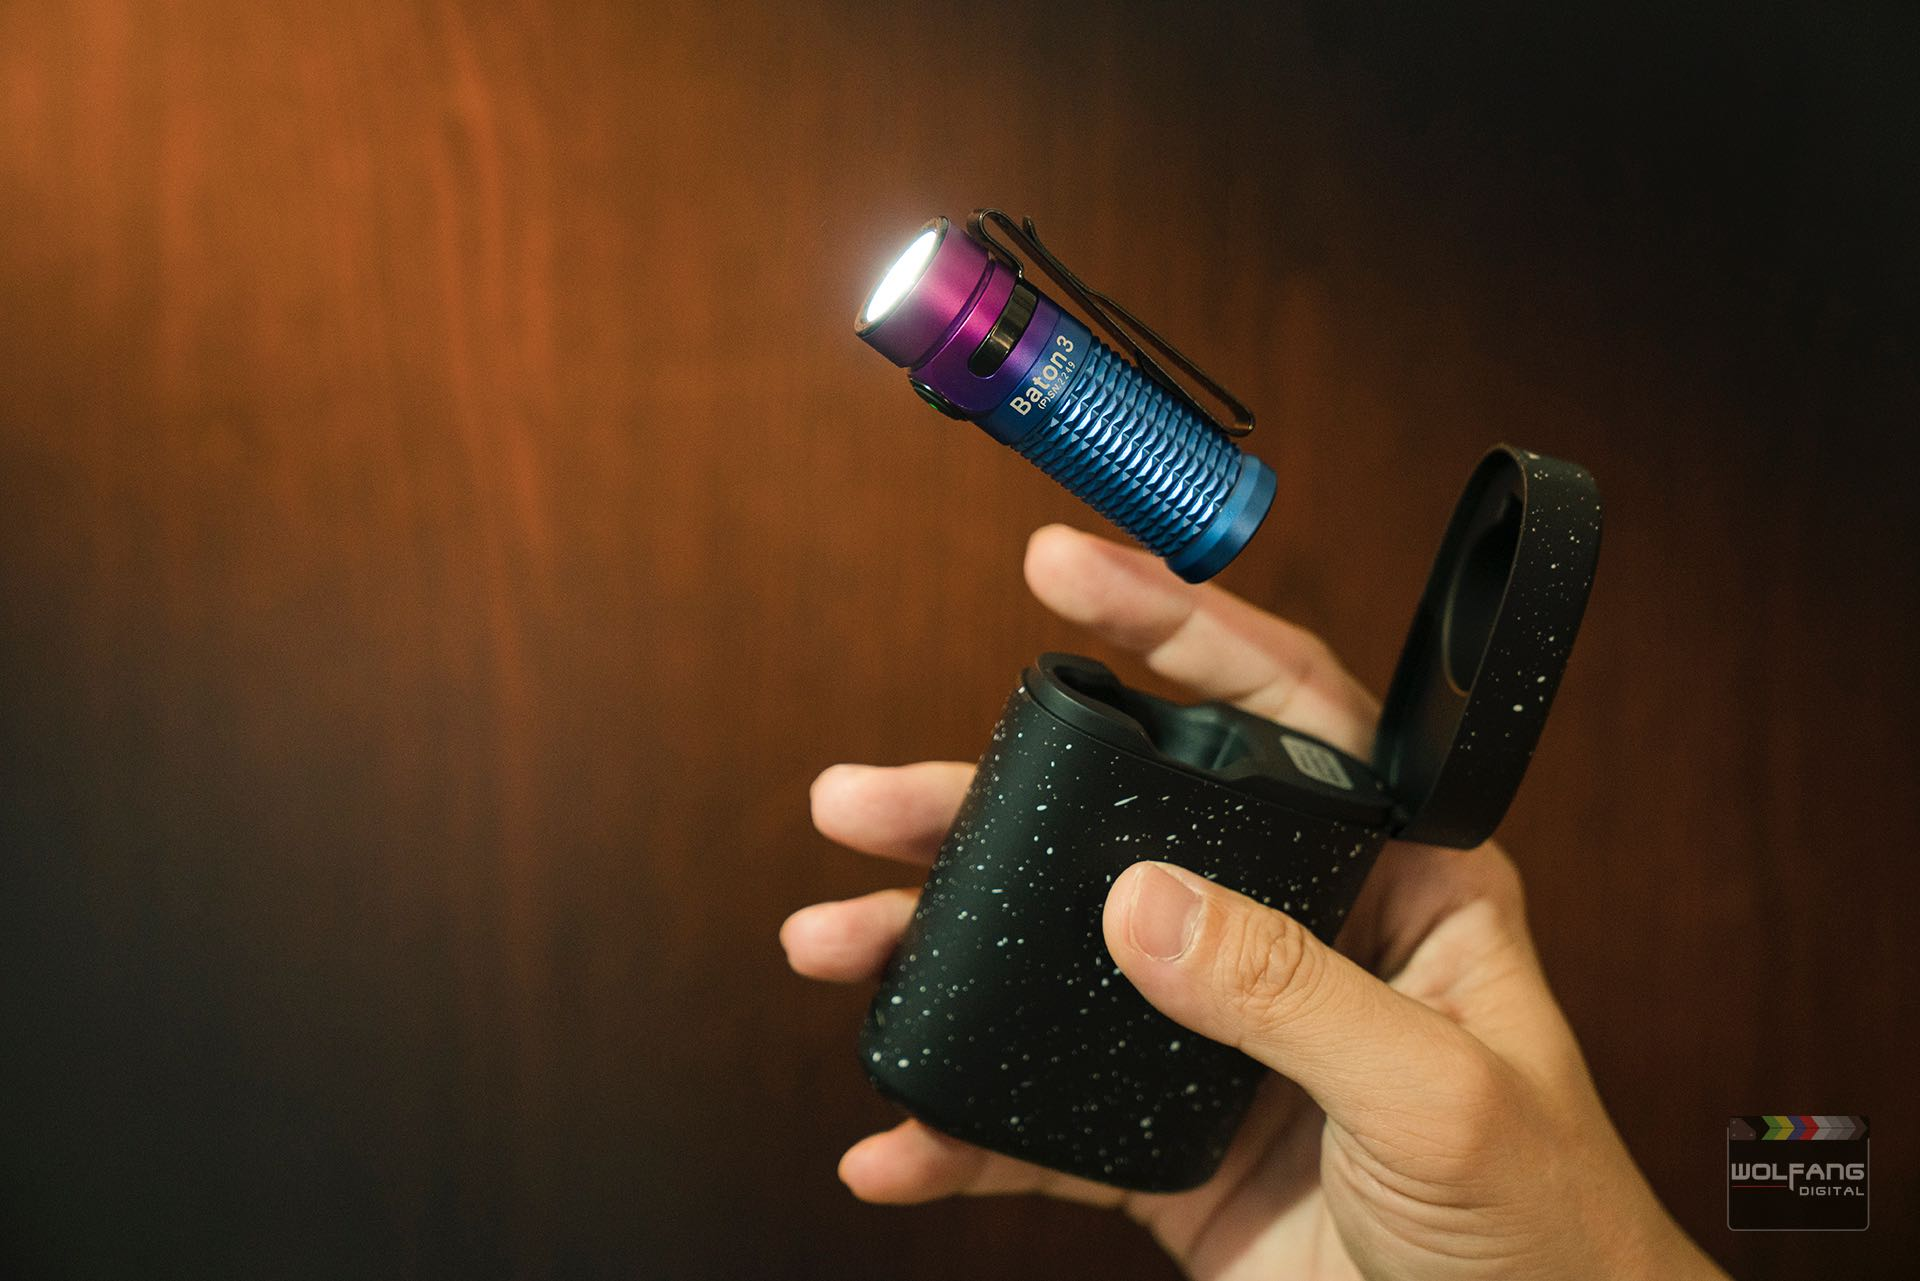 WolFang Photography tip 1- Olight Baton 3 Pocket Light